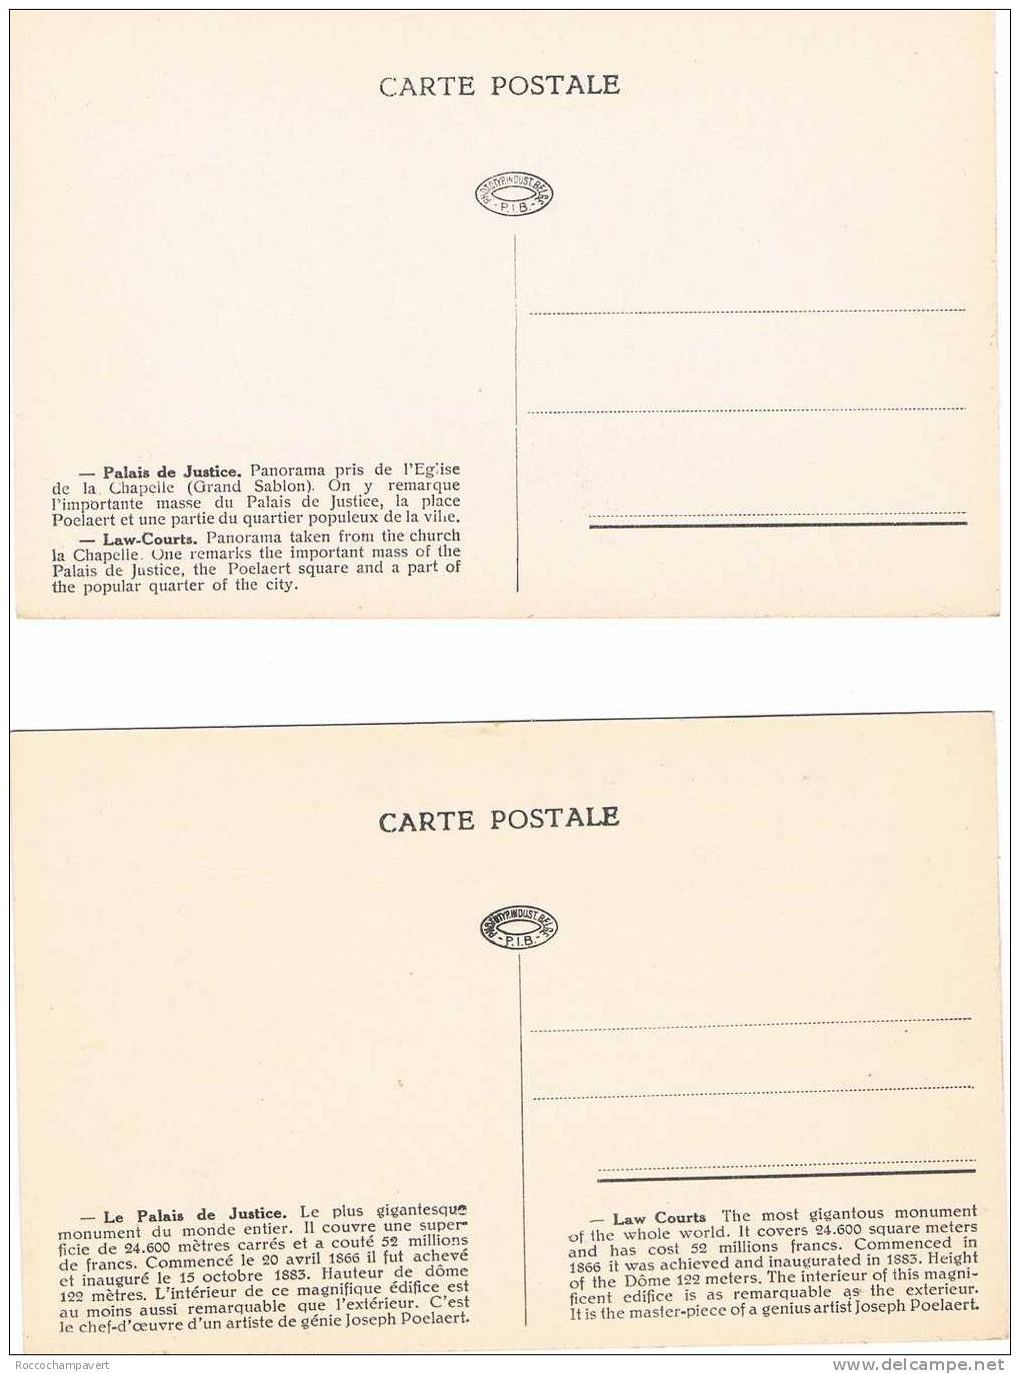 Carte Postale Ancienne - BRUXELLES - PALAIS DE JUSTICE LOT DE 2 CARTES - Monumentos, Edificios